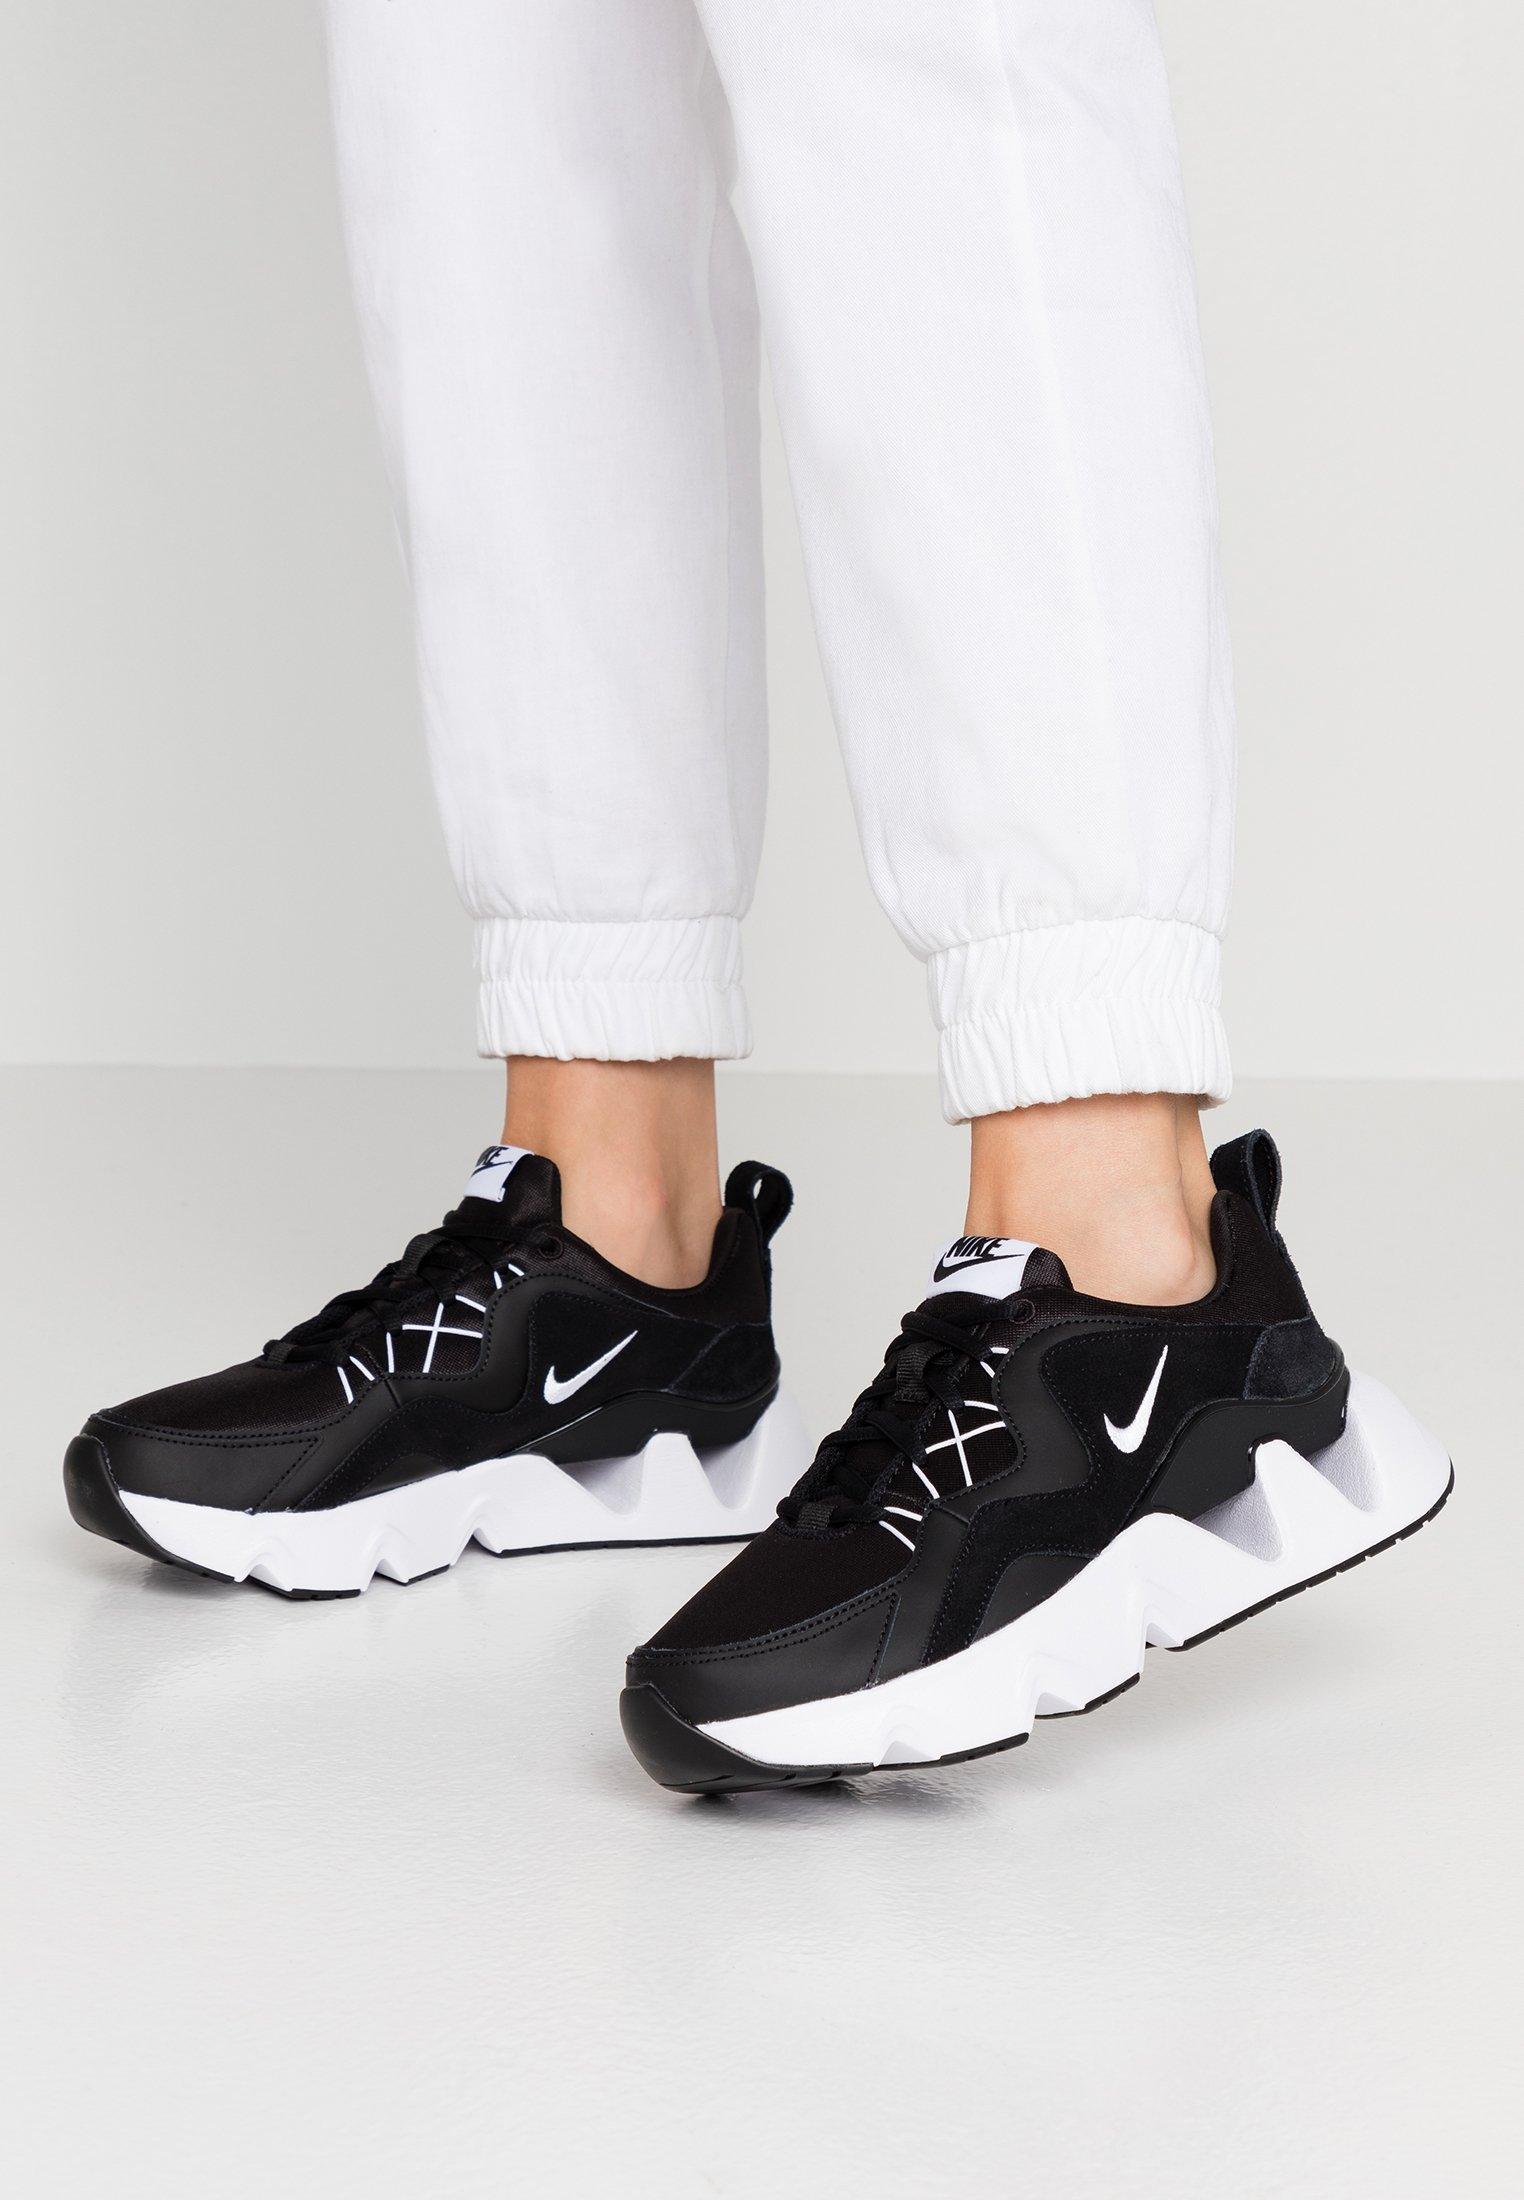 inteligencia Contribuyente matrimonio  Nike Sportswear RYZ - Zapatillas - black/white/negro - Zalando.es